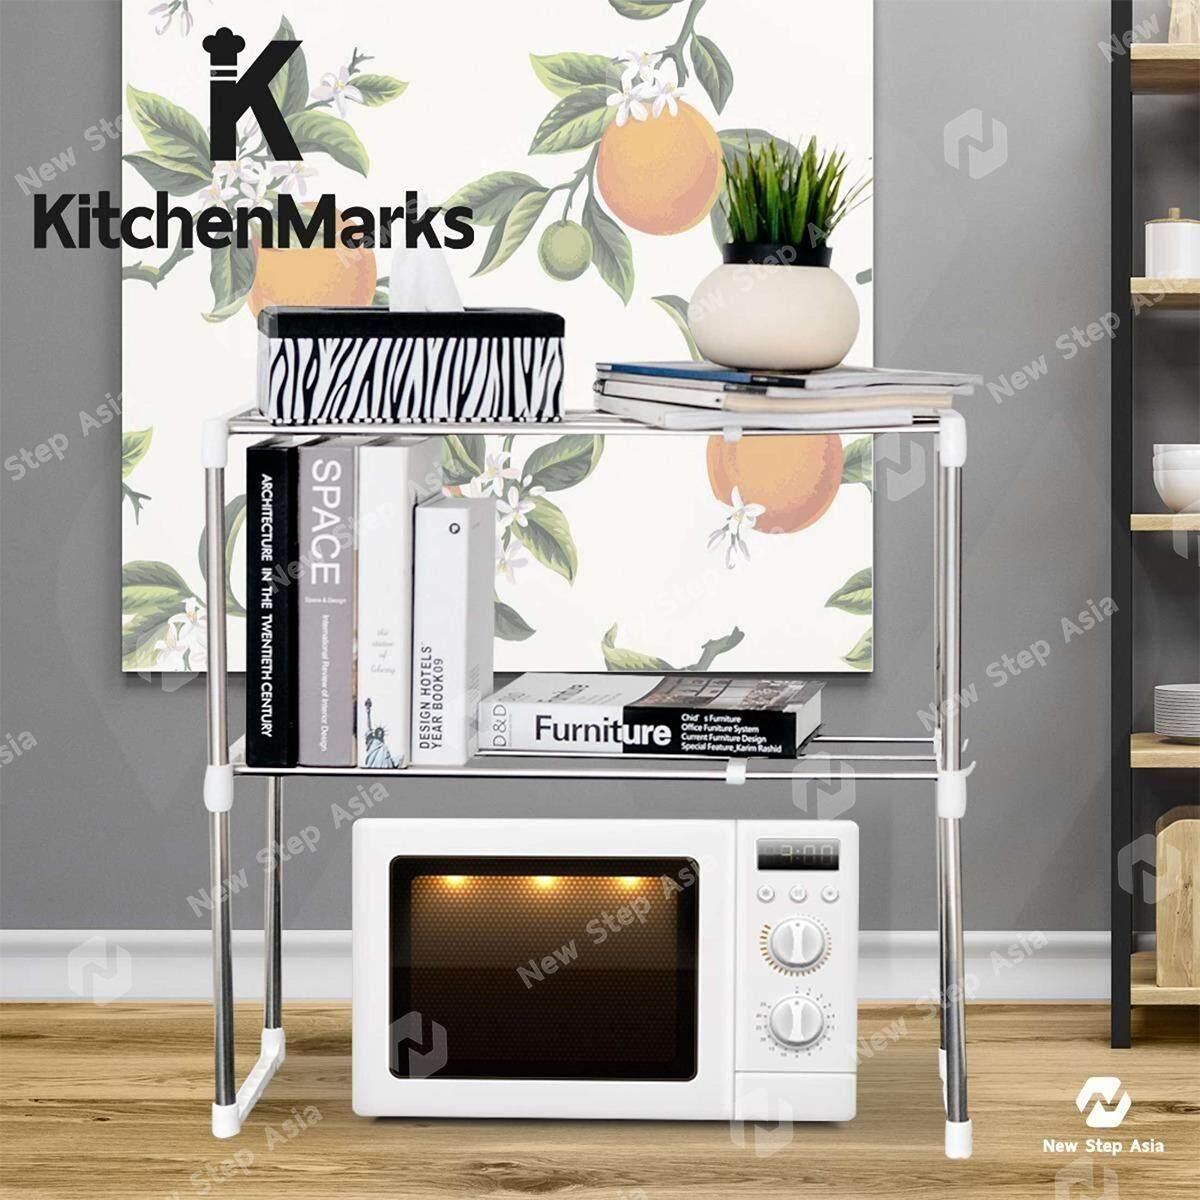 Kitchenmarks ชั้นวางคร่อมไมโครเวฟ ชั้นวางของสแตนเลส ชั้นสแตนเลส ปรับความยาวได้ สำหรับวางของคร่อมไมโครเวฟ Microwave Rack Kitchen Shelves New Step Asia.